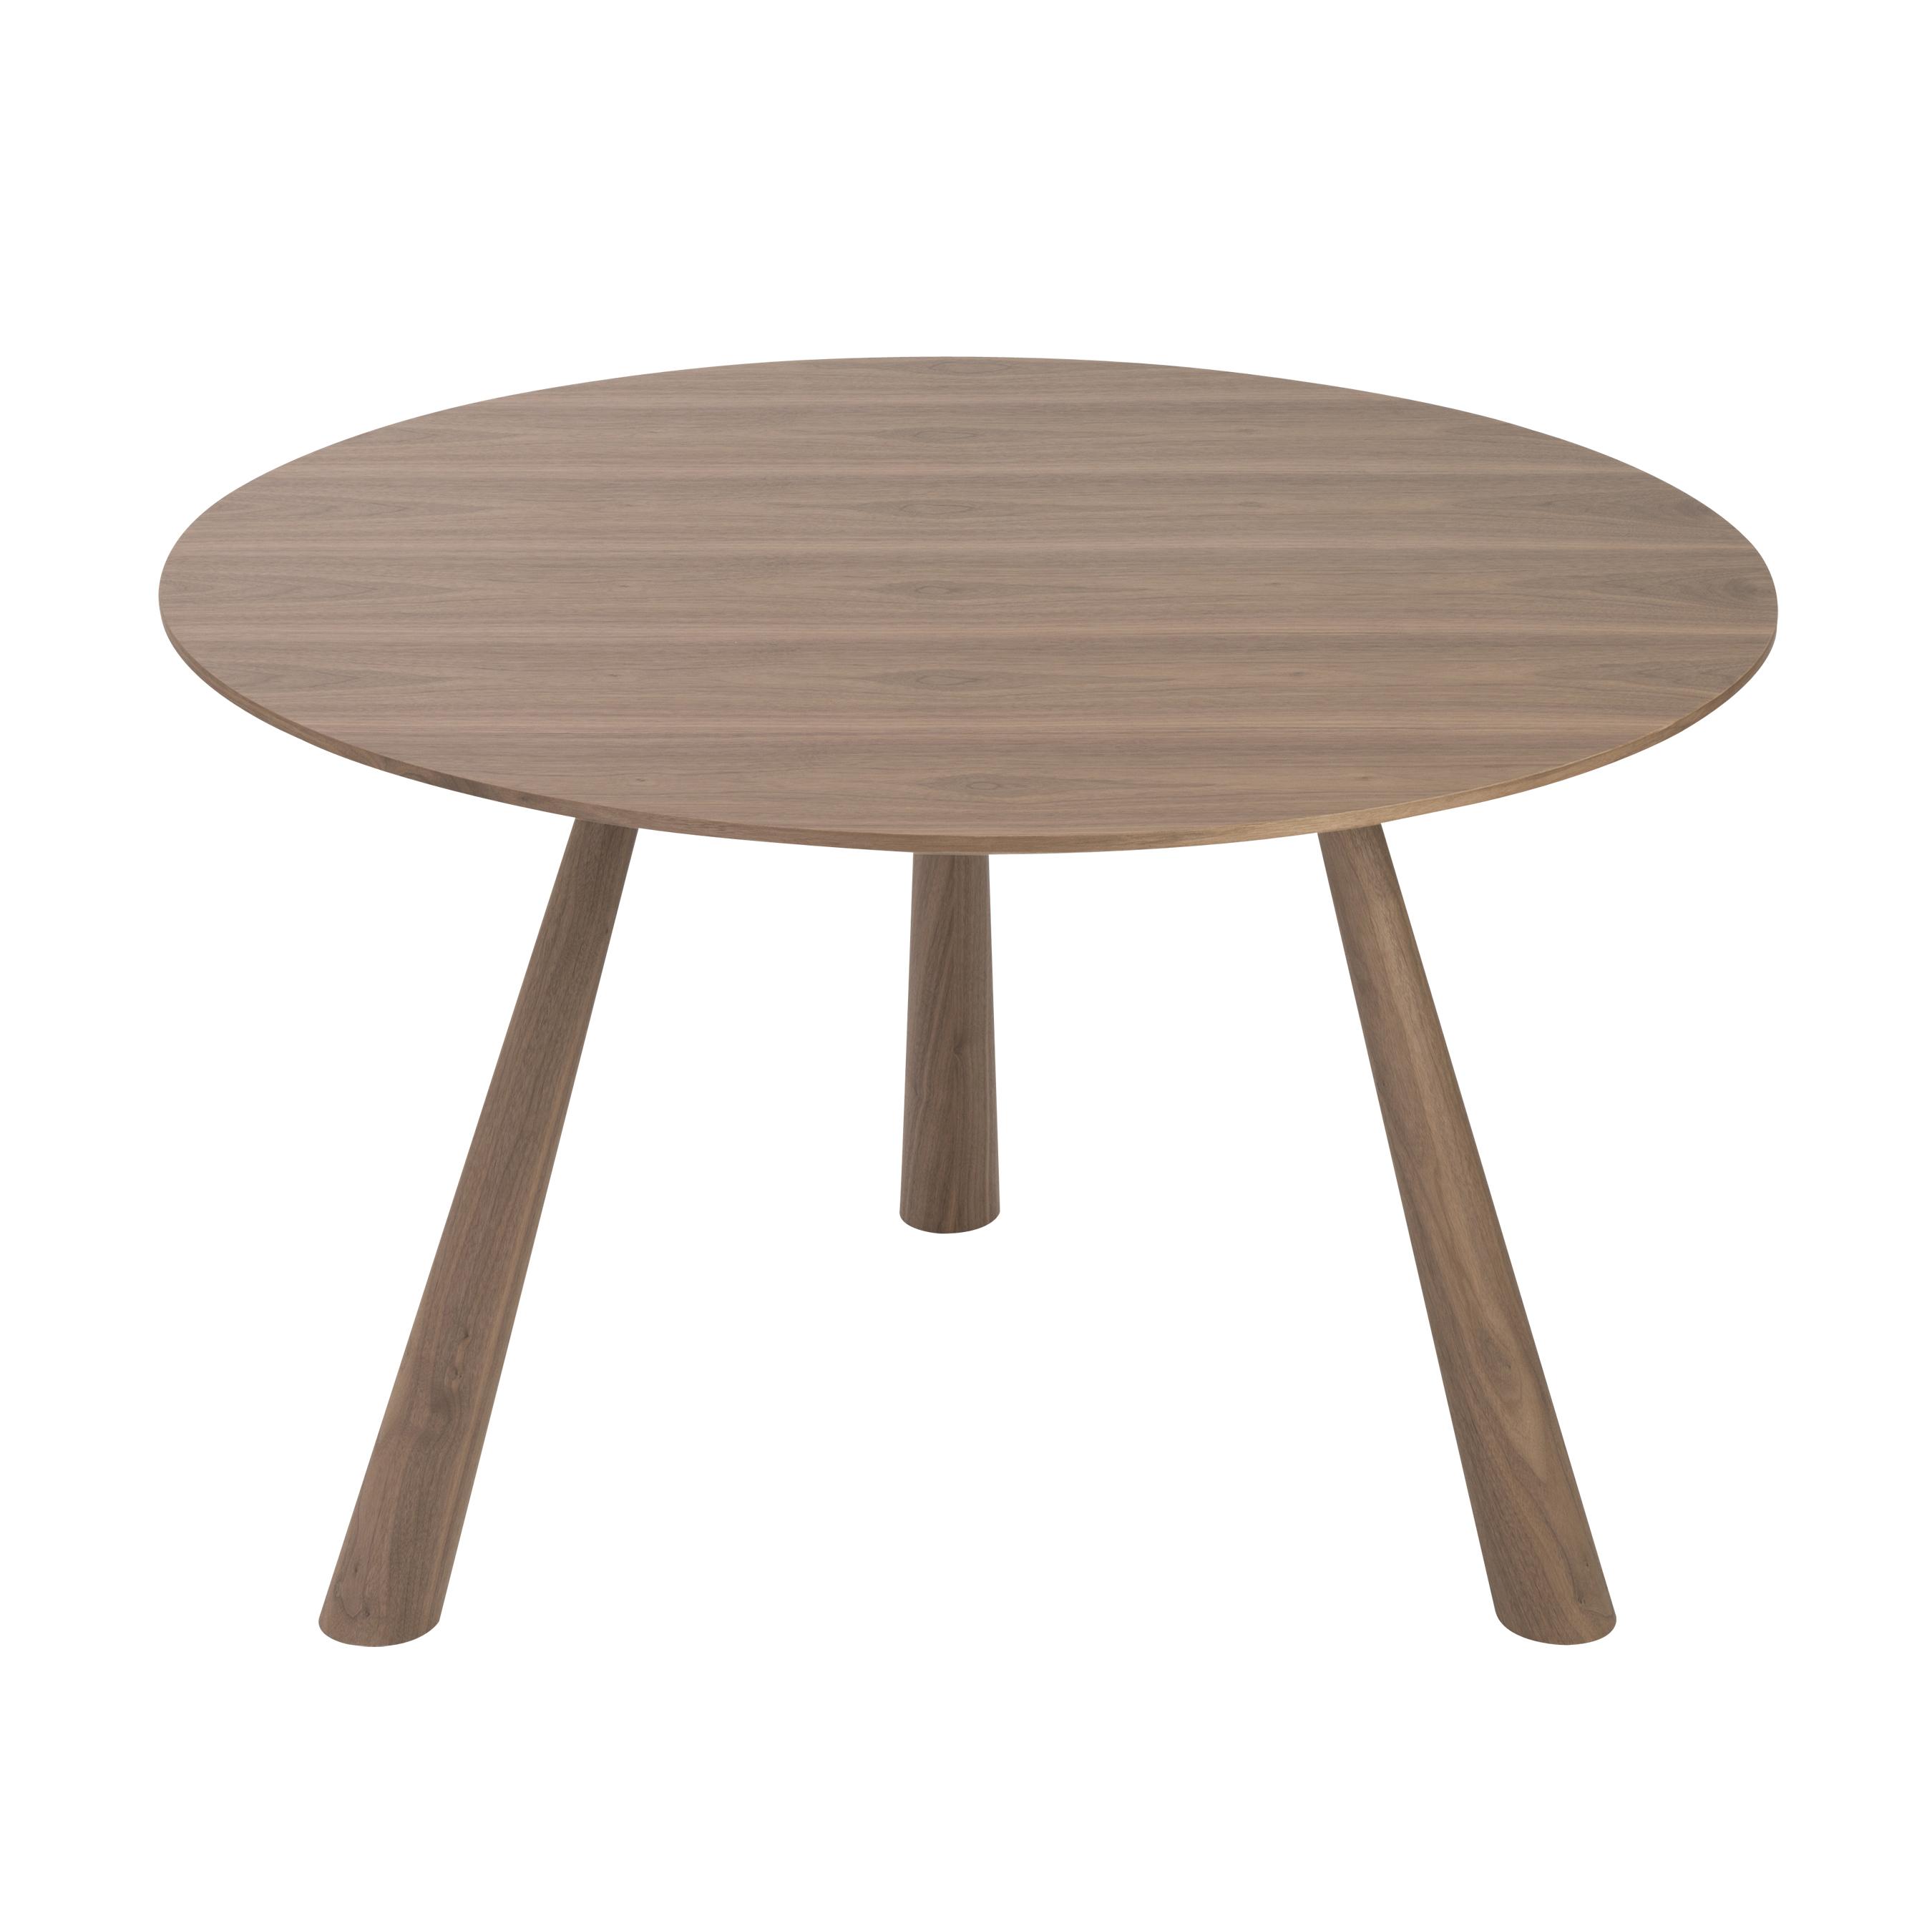 eurostyle-dabney-table.jpg